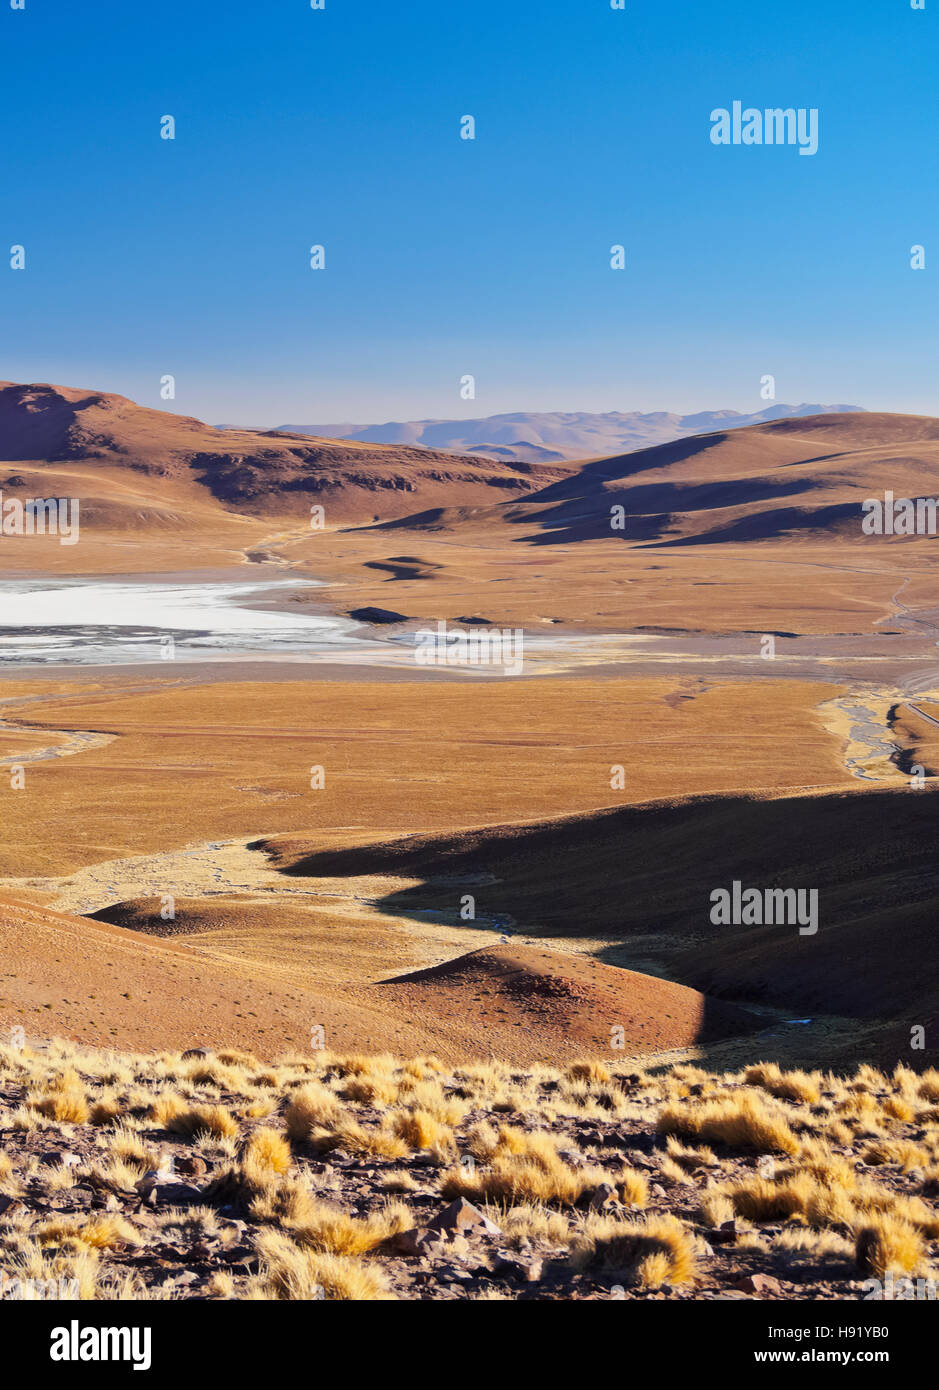 Bolivia, Potosi Department, Sur Lipez Province, View towards Laguna Morejon. - Stock Image